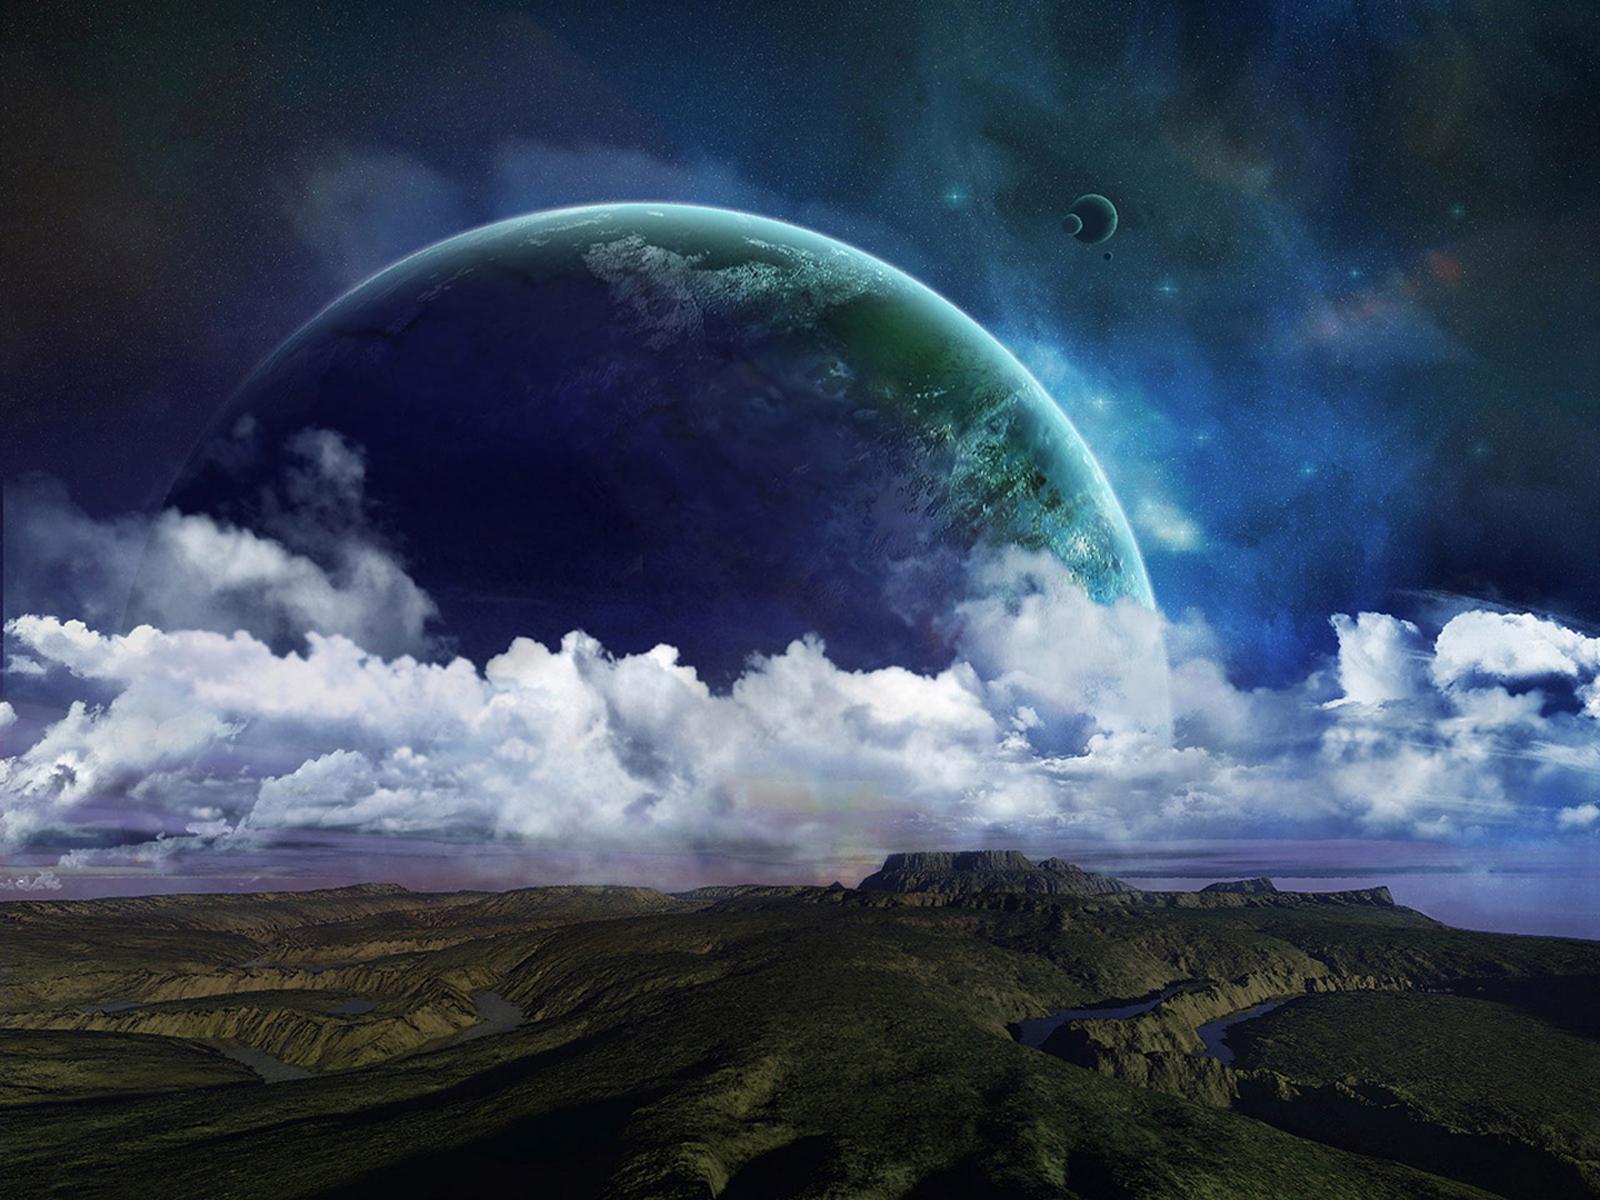 HHMZZ HD Digital Universe Wallpapers 1600x1200